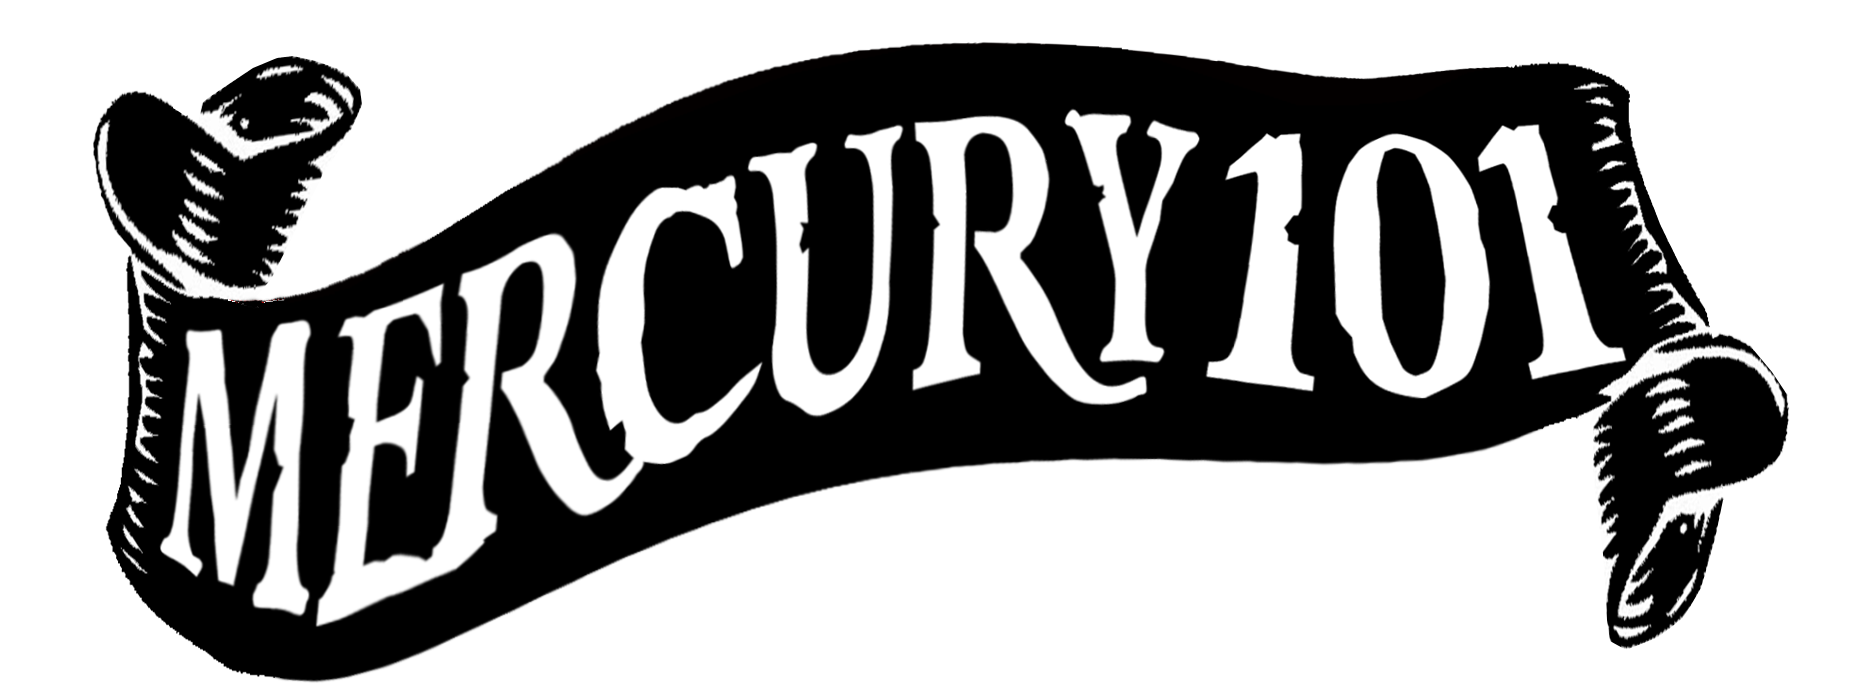 Mercury 101 Banner Scroll Logo 160114 160207 Clarke .png